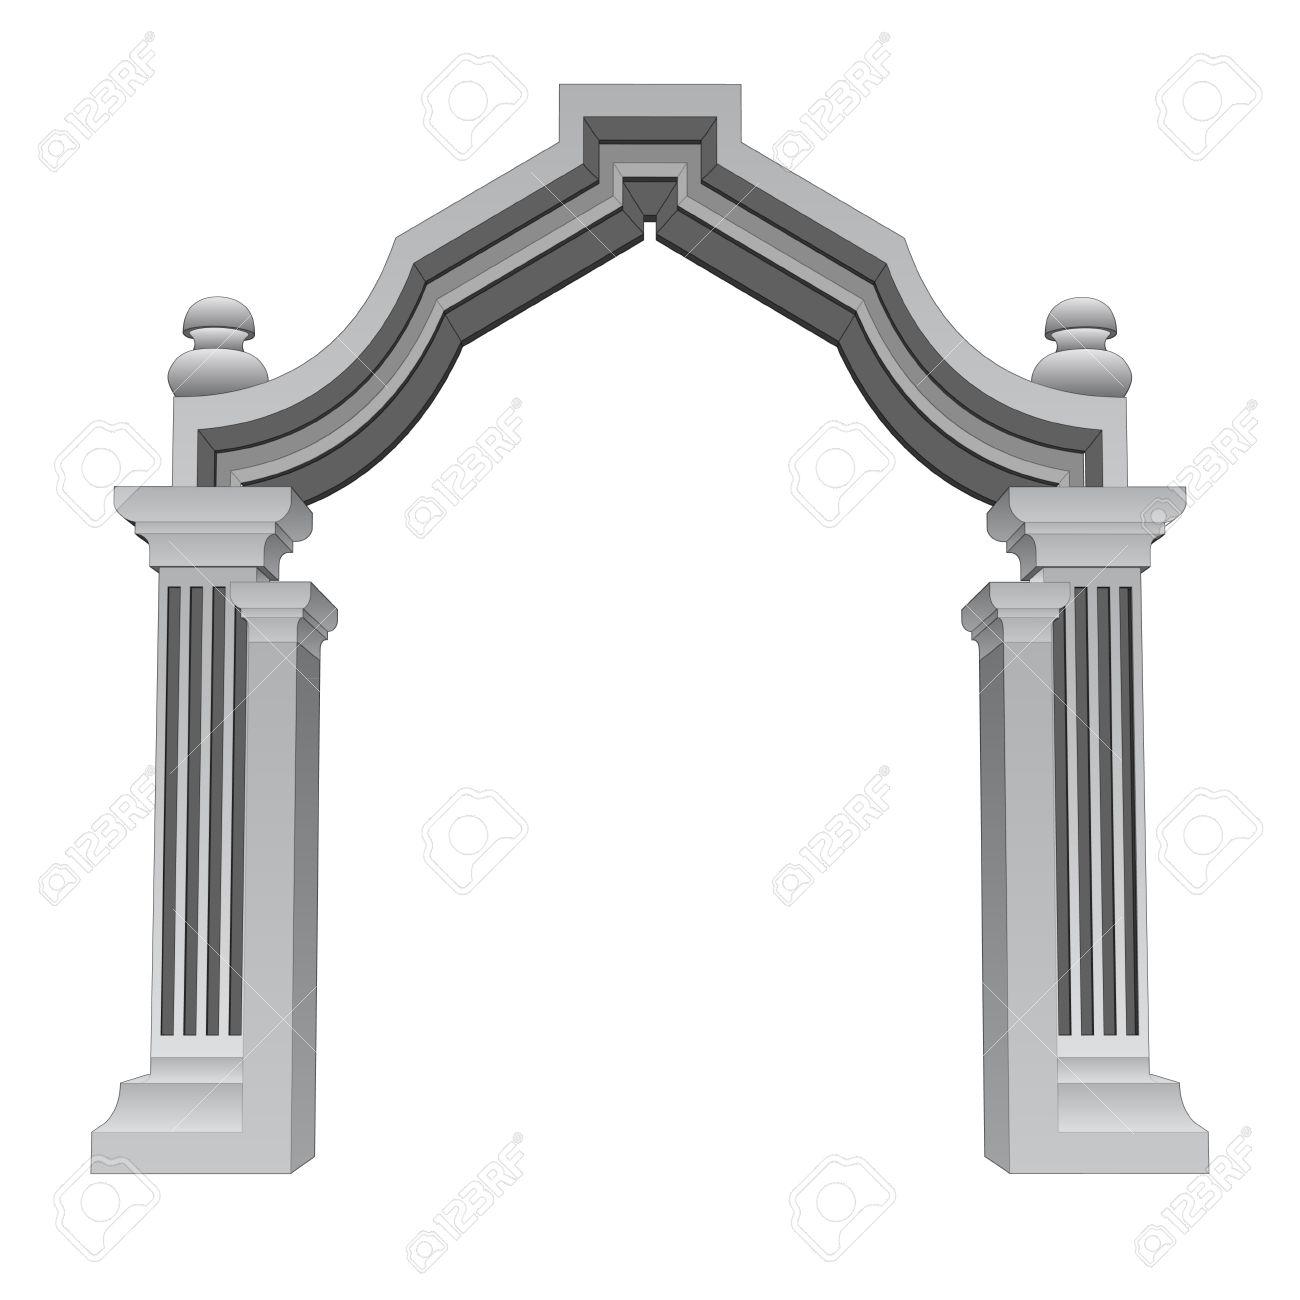 Marble Stone Baroque Entrance Gate Frame Vector Illustration.